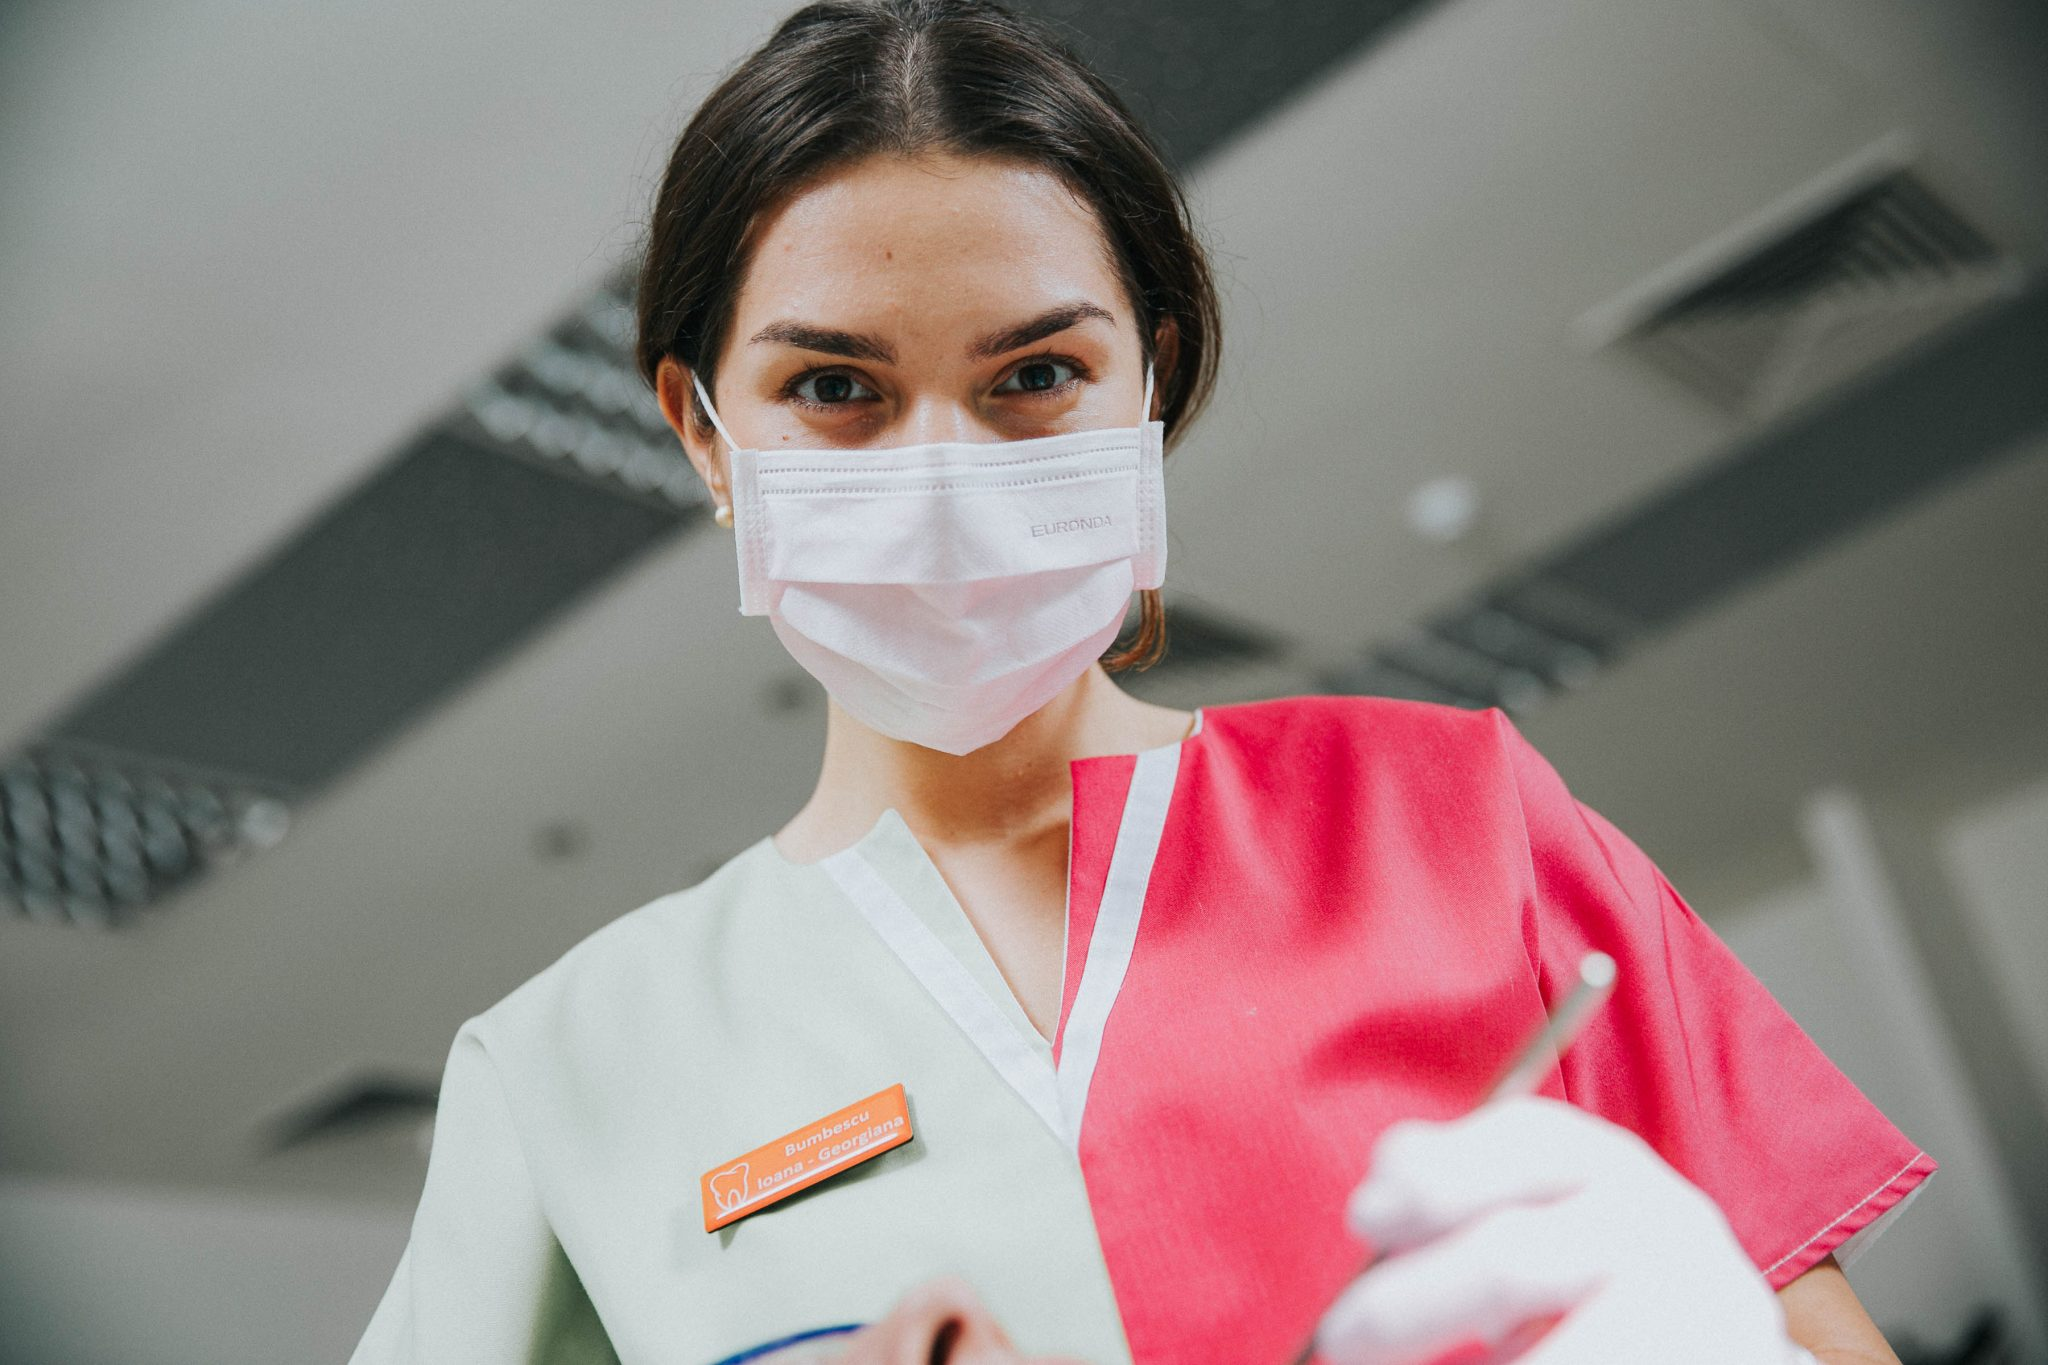 facultatea de stamatologie targu mures UMF absolvenit stamatolog medic doctor fotografie comerciala fotograf profesionist majos daniel_-26